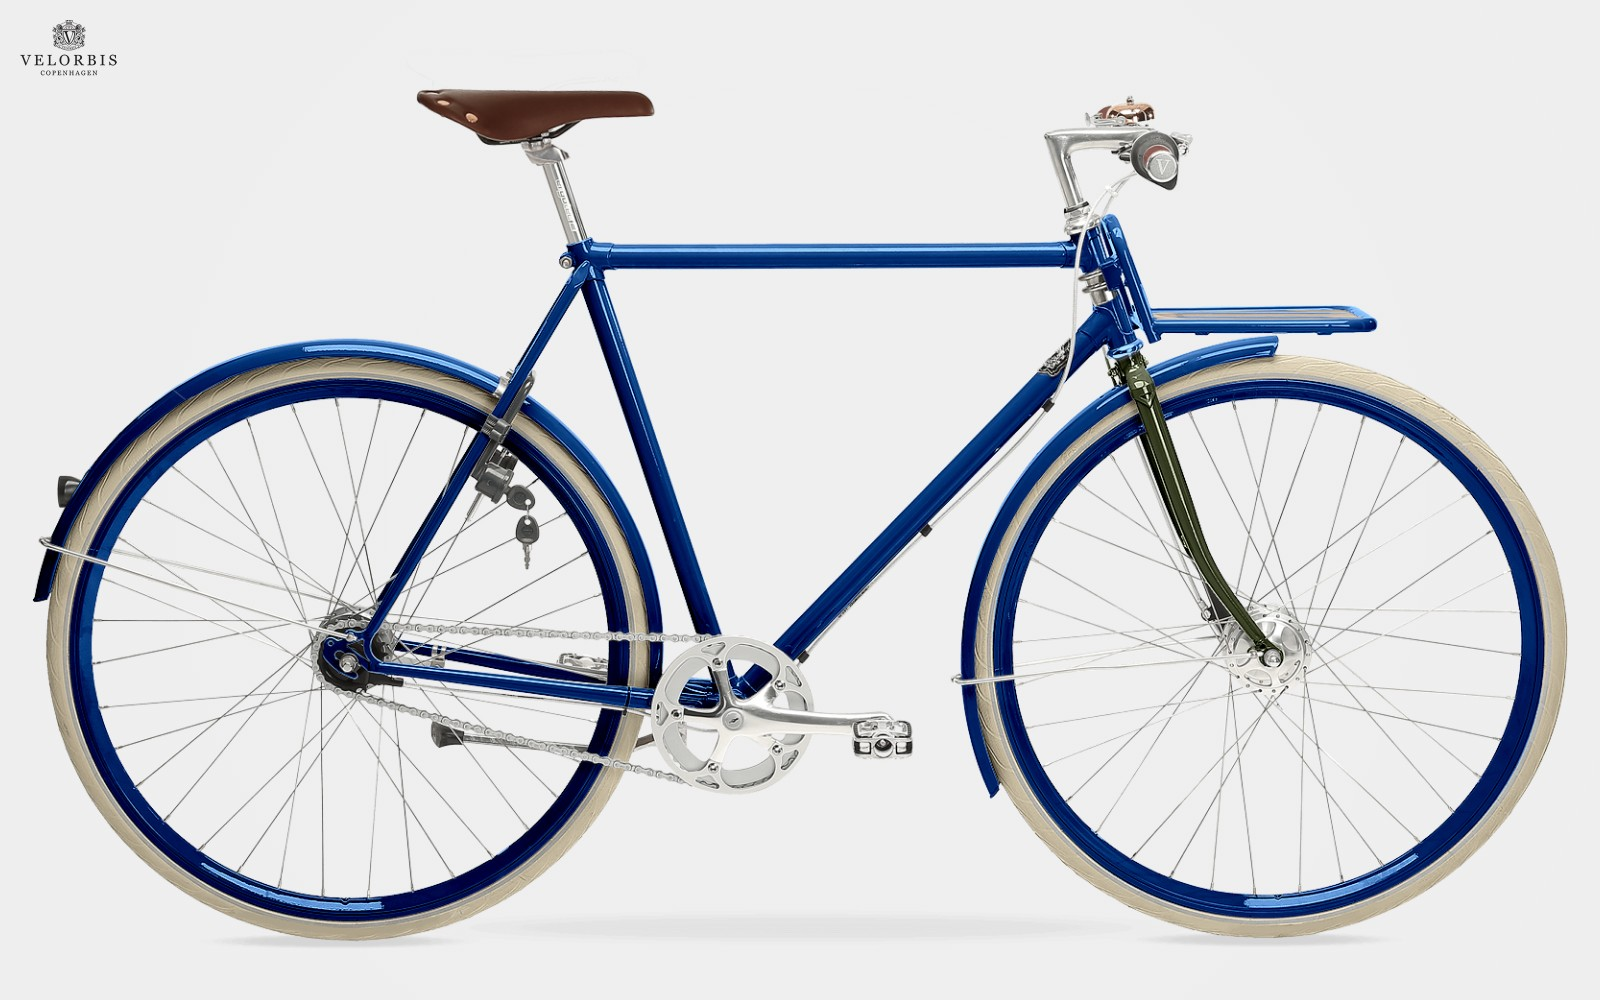 Bicicletas deportivas-Velorbis